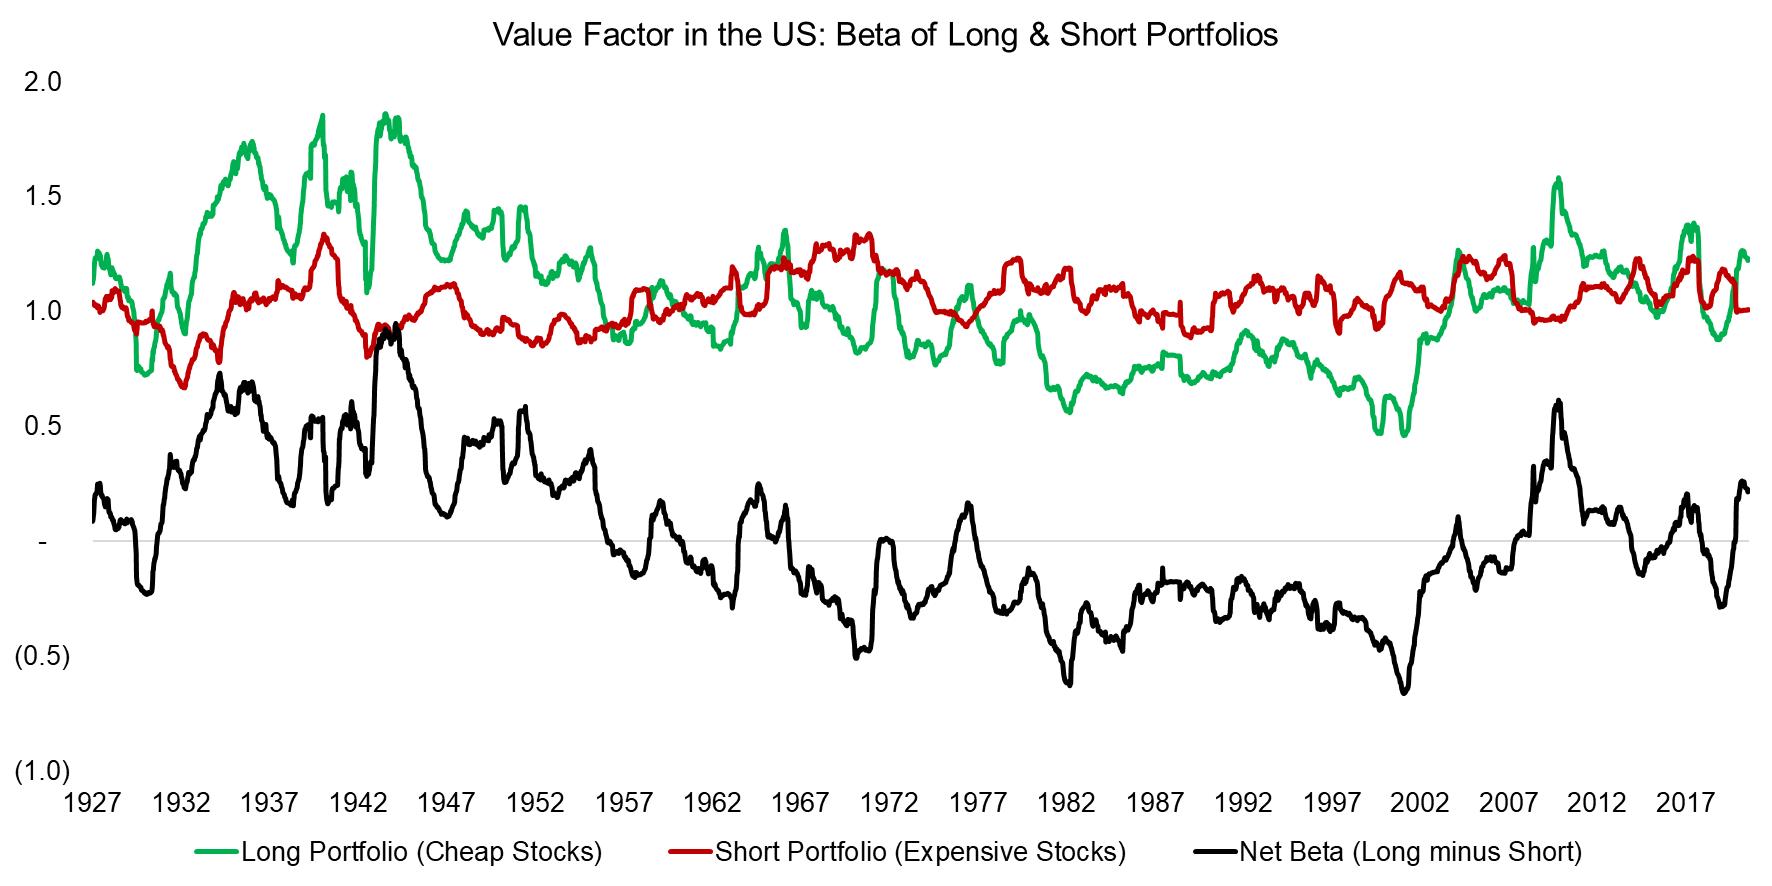 Value Factor in the US Beta of Long & Short Portfolios